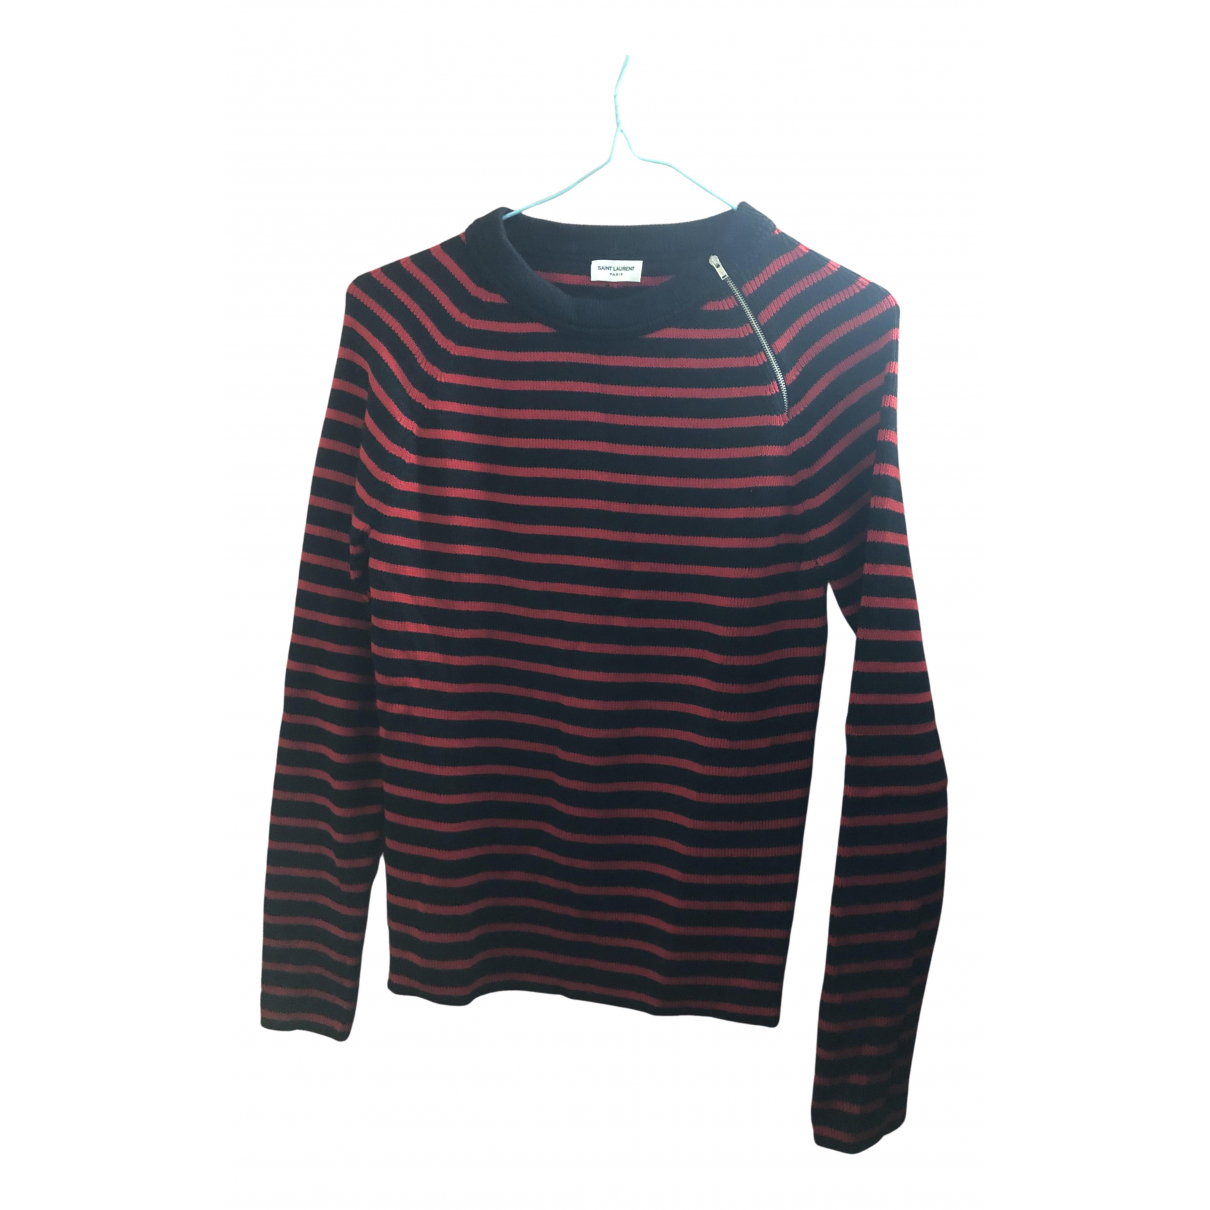 Saint Laurent N Red Wool Knitwear & Sweatshirts for Men M International